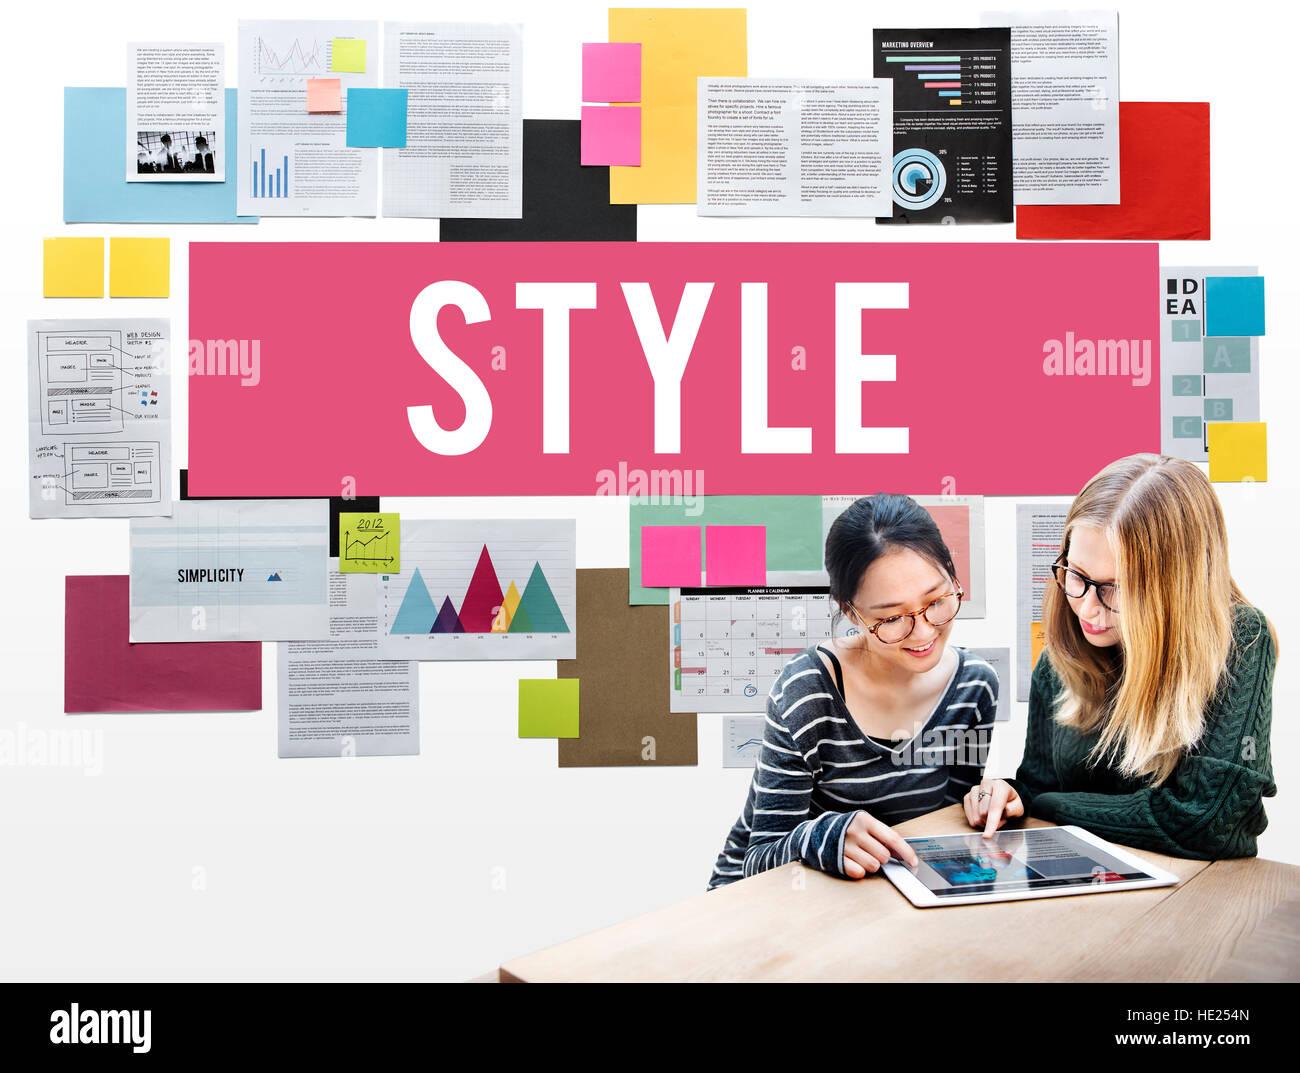 Style Fashionable Design Trendy Posh Concept - Stock Image